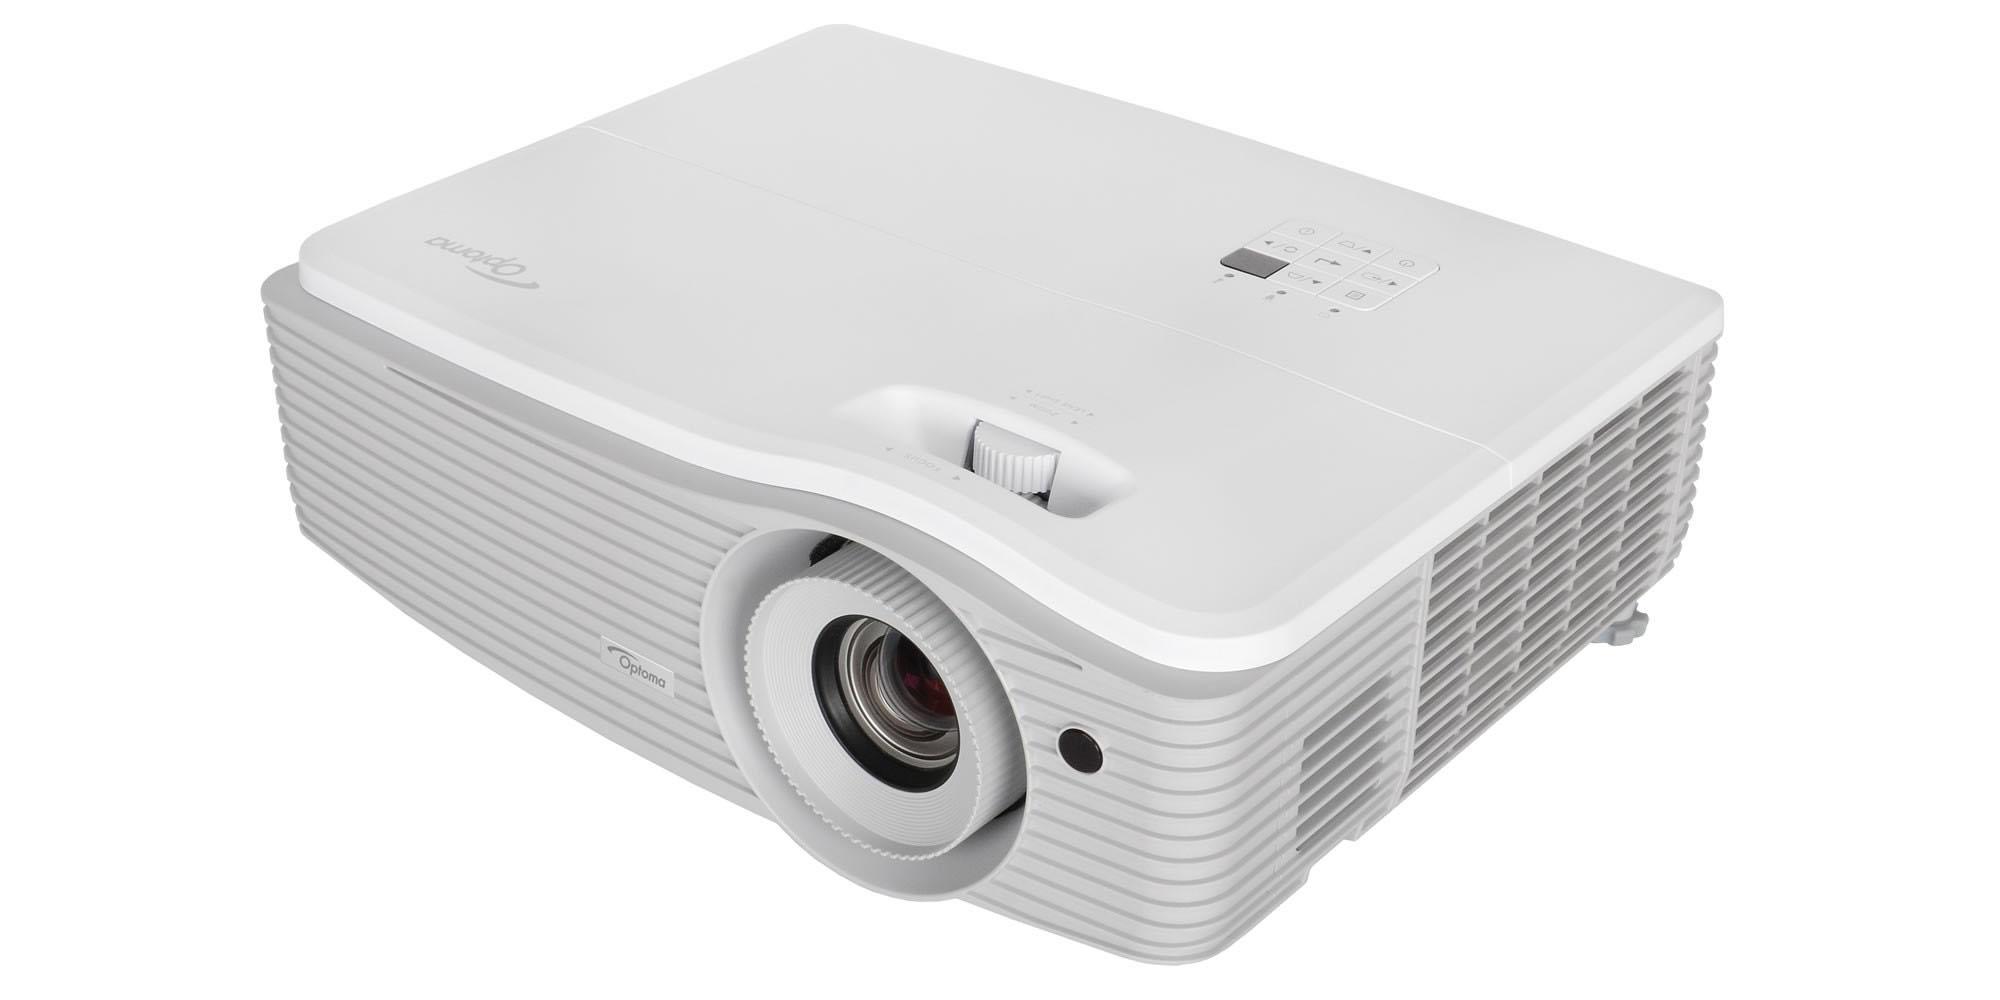 Optoma X502 DLP 3D ความสว่าง 5000 lm XGA 1024x768 Contrast 15000:1